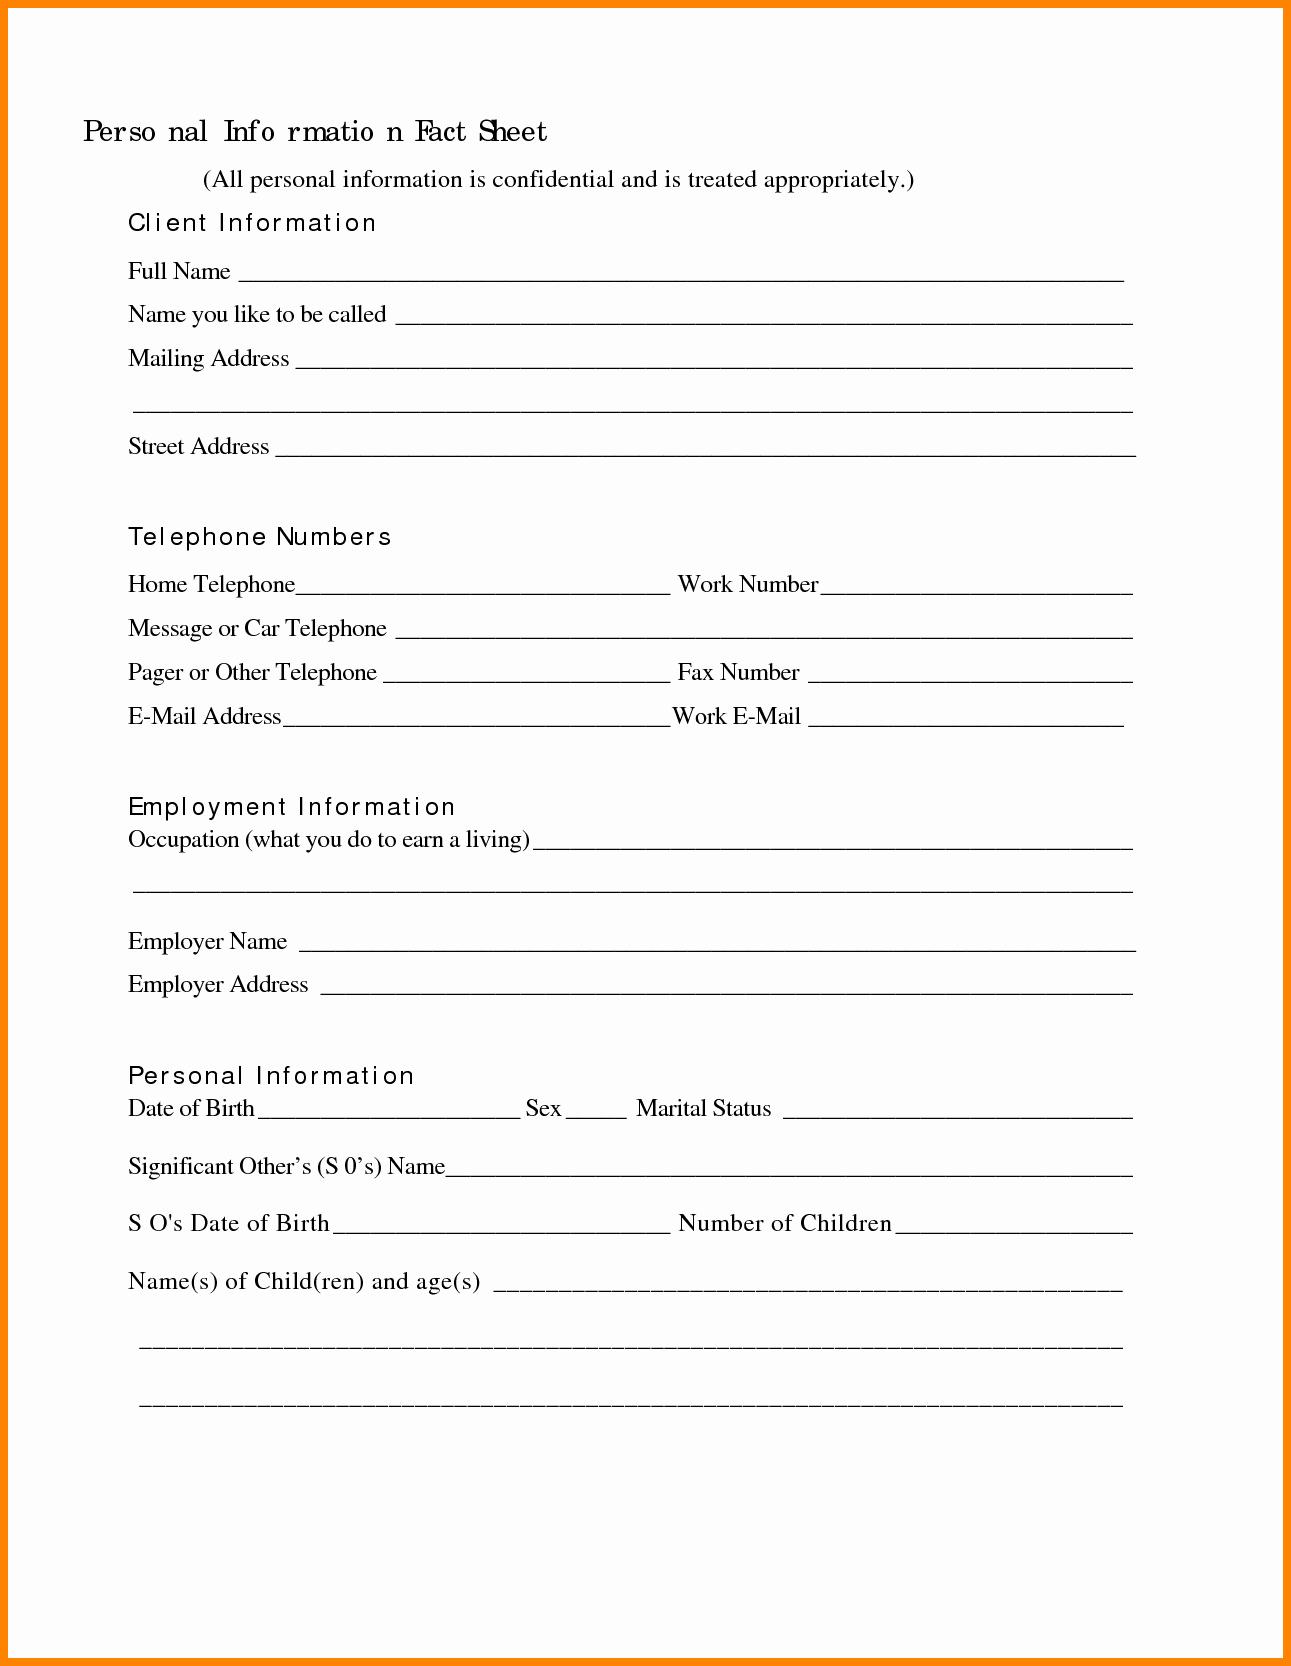 Personal Information Sheet Template Elegant Information Template Portablegasgrillweber